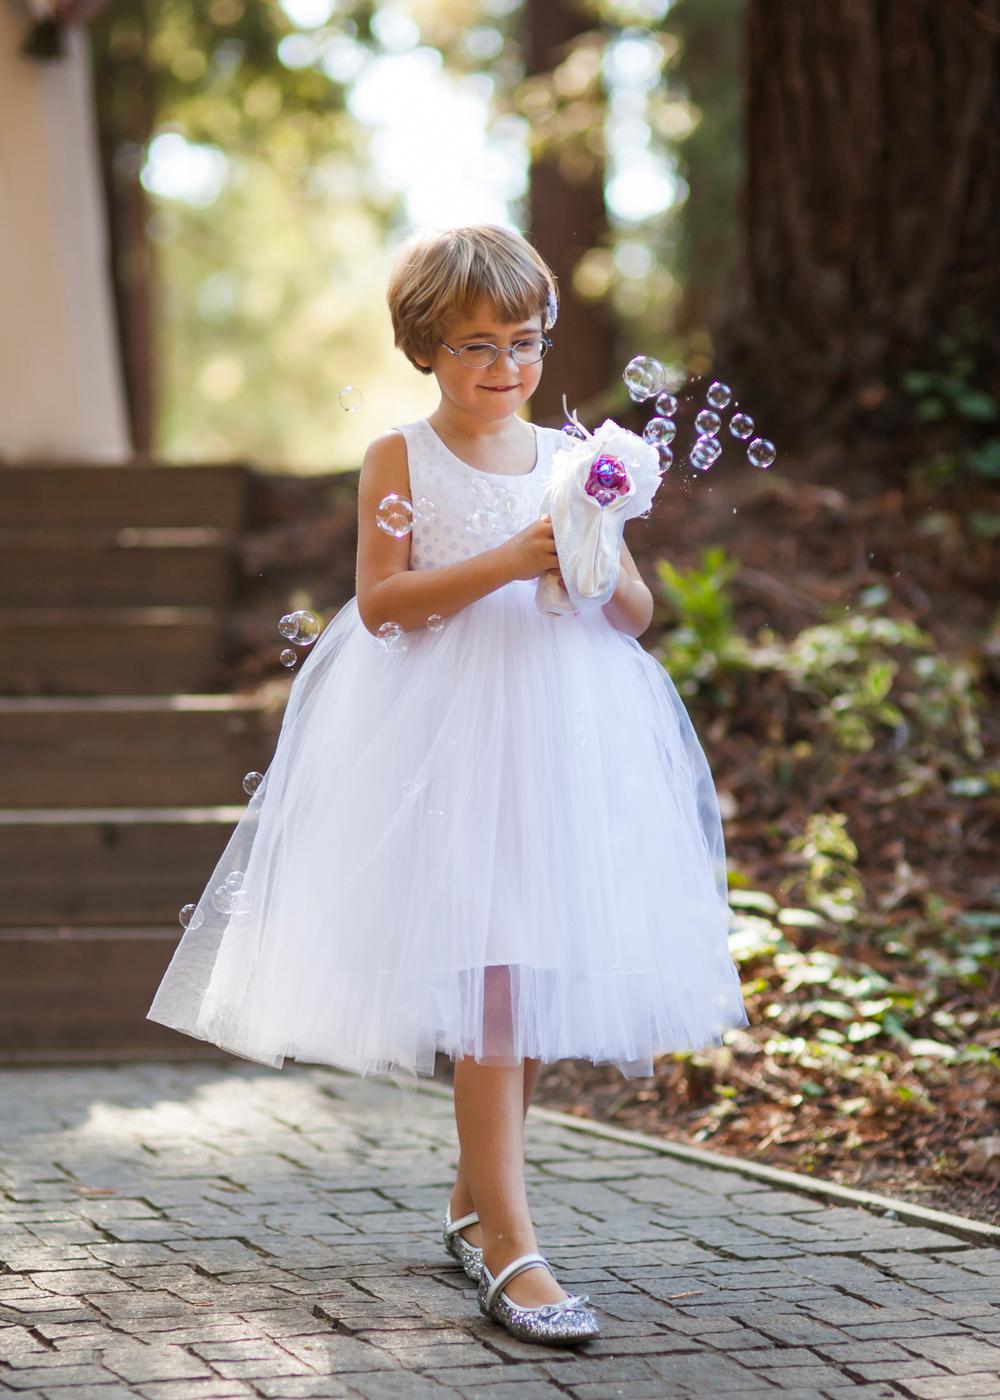 pema-osel-ling-santa-cruz-wedding-photography-lilouette-36.jpg